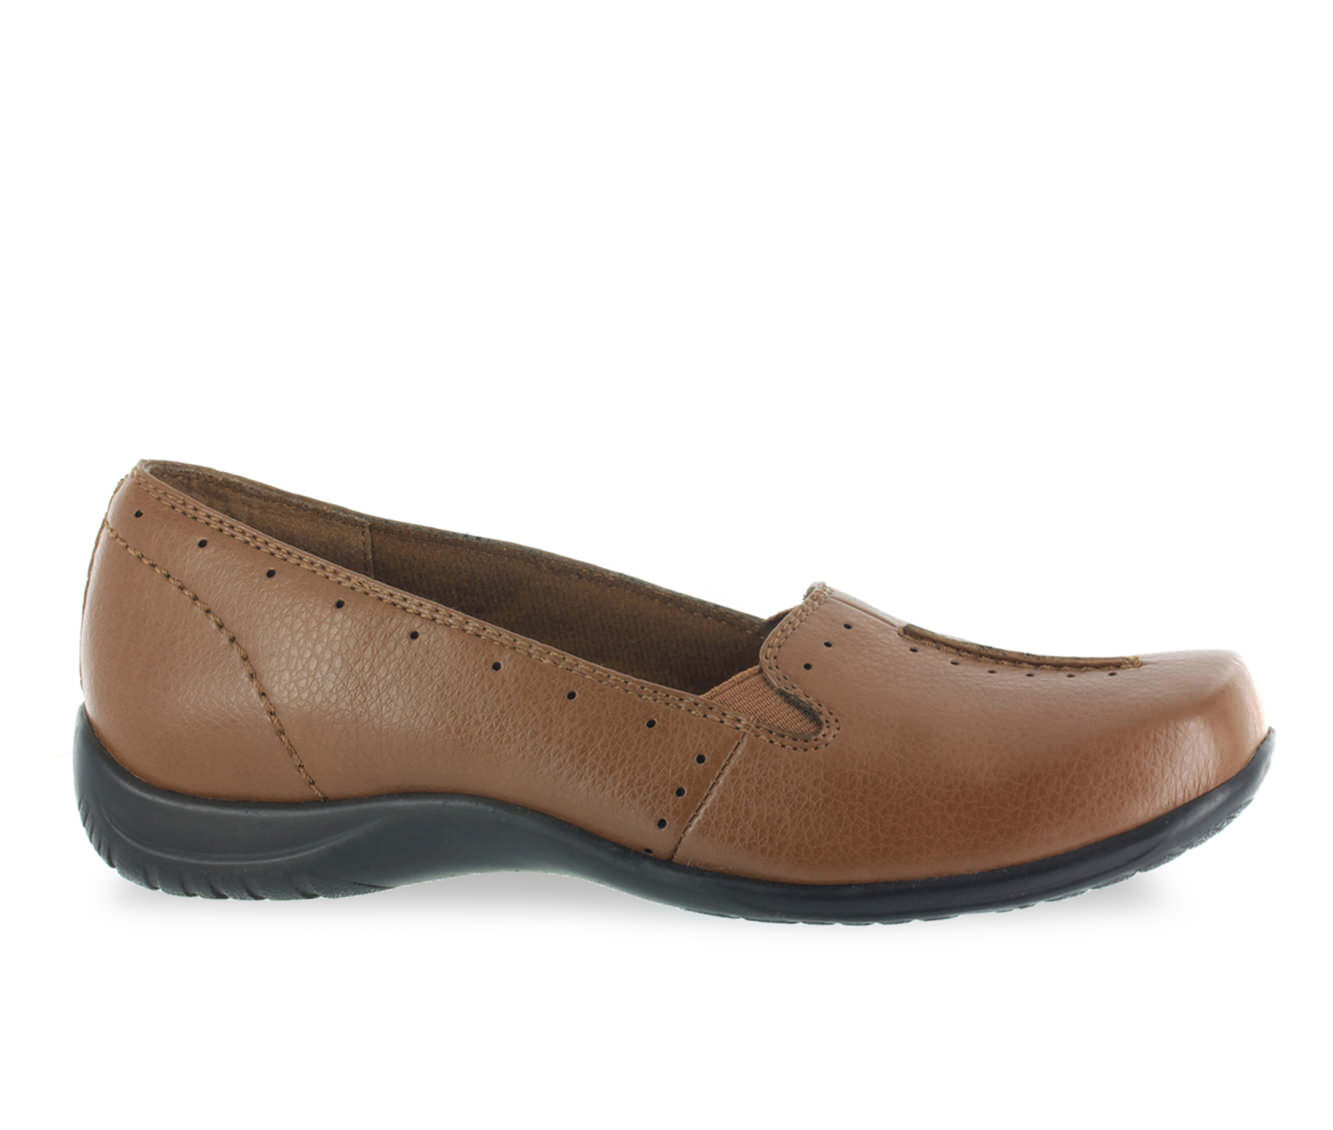 Latest Fashion Women's Easy Street Purpose Shoes Tan Tumbled